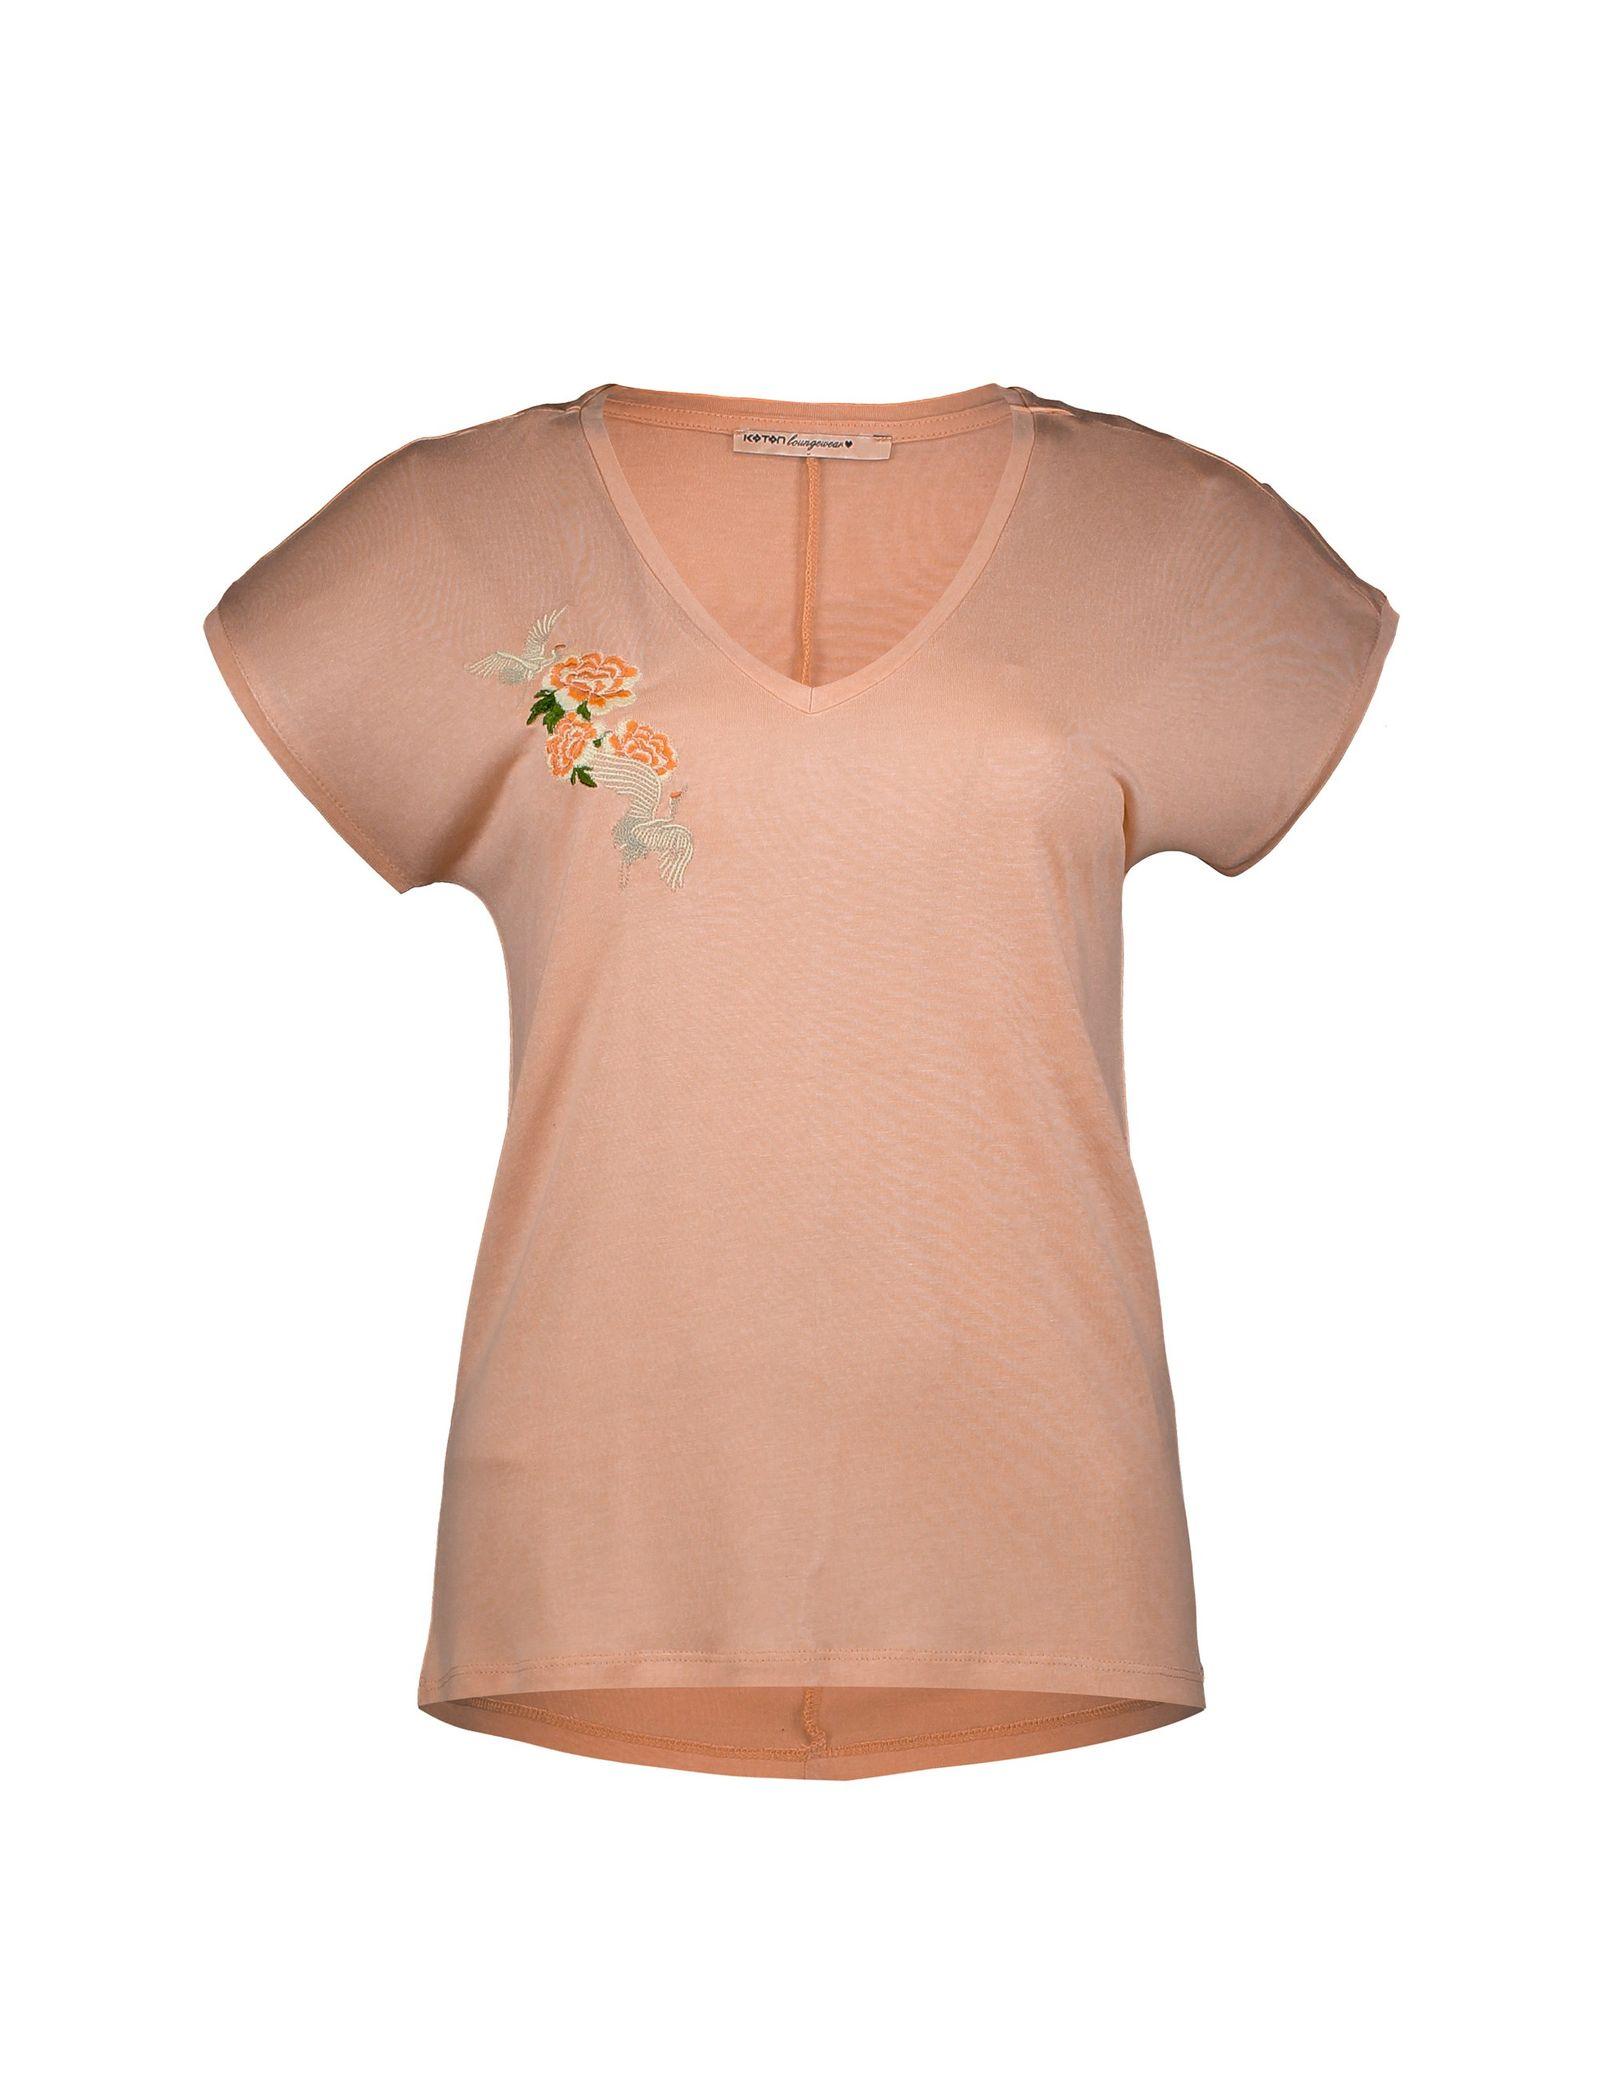 تی شرت ویسکوز یقه هفت زنانه - کوتون - صورتي - 1